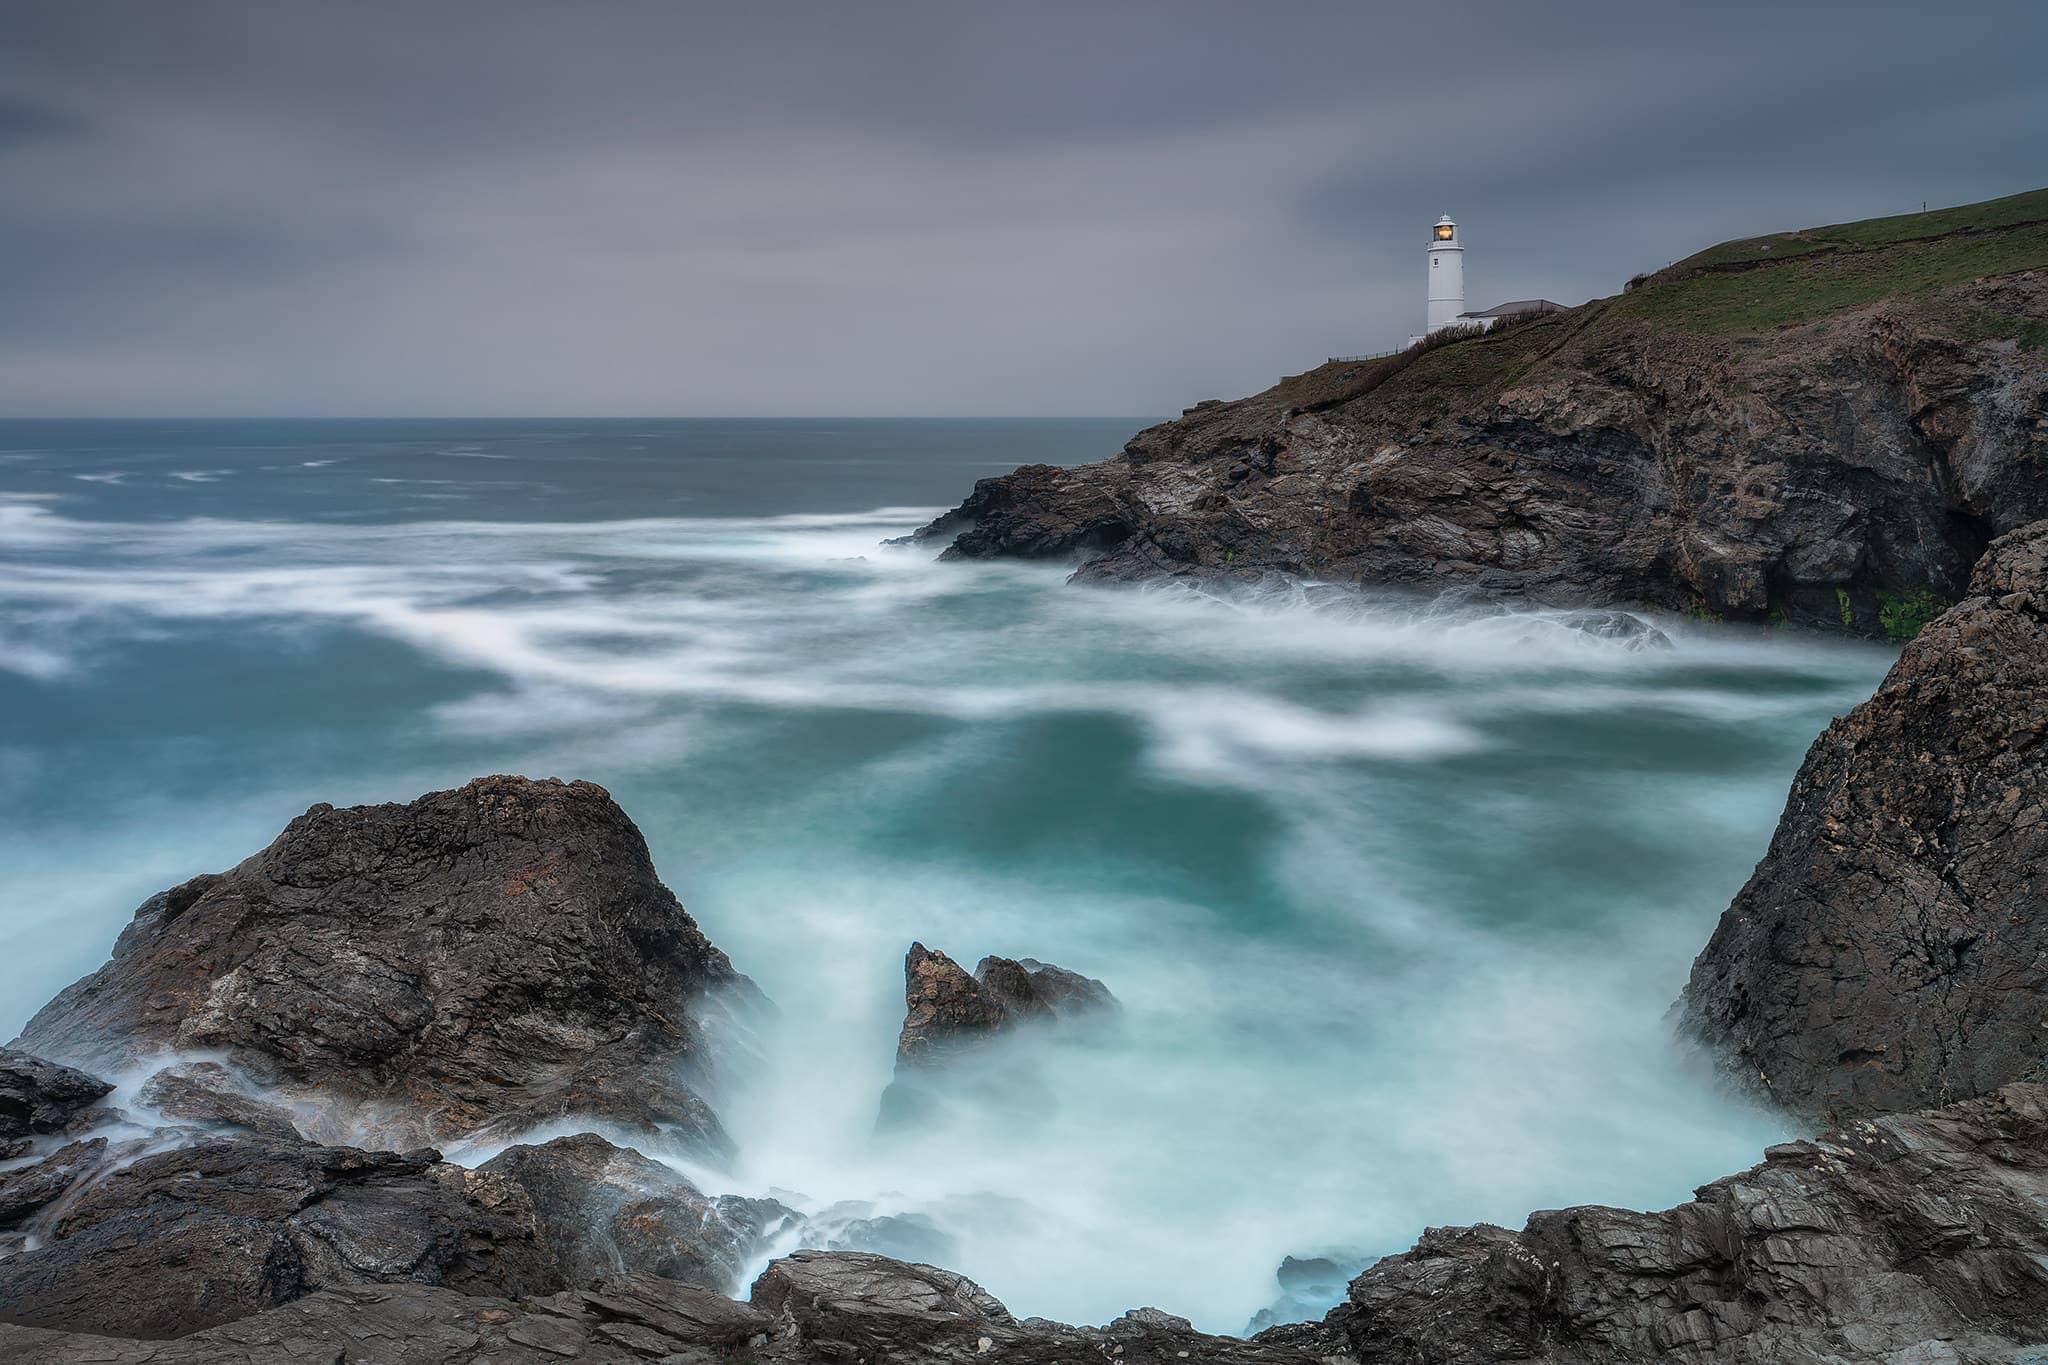 Francesco Gola Seascape Trevose Lighthouse UK Landscape Long Exposure Photography